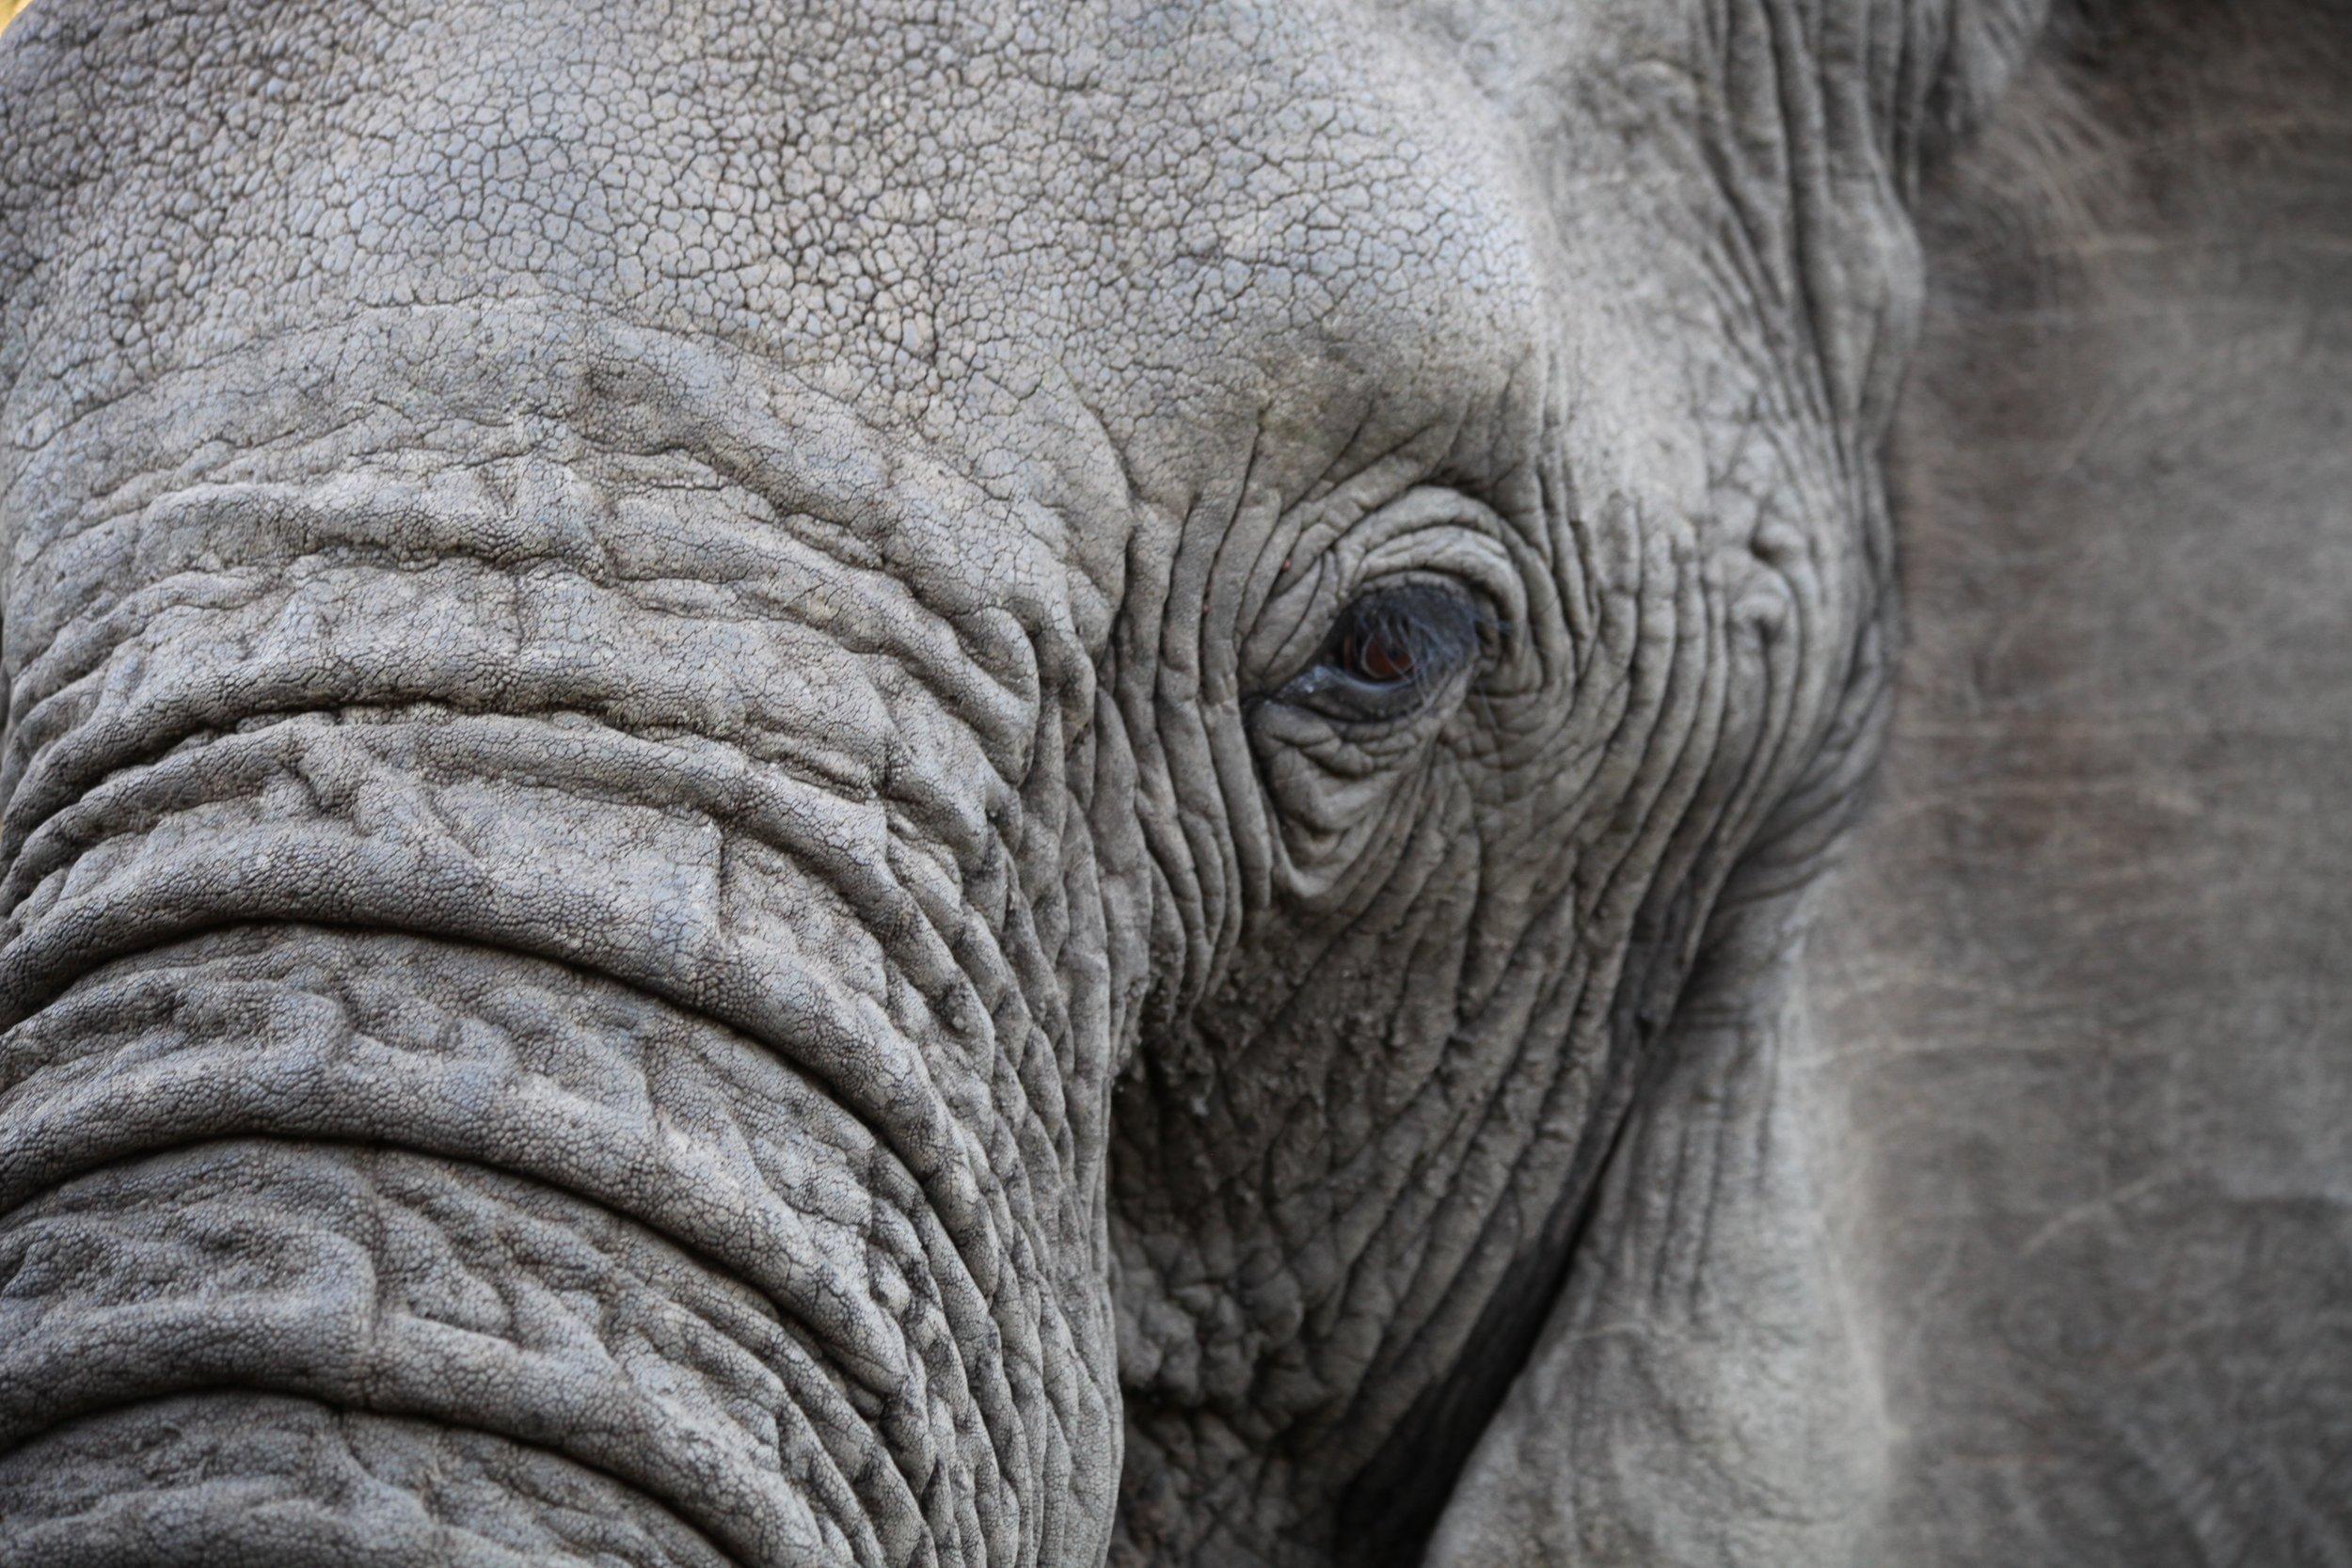 elephant_eye_CT